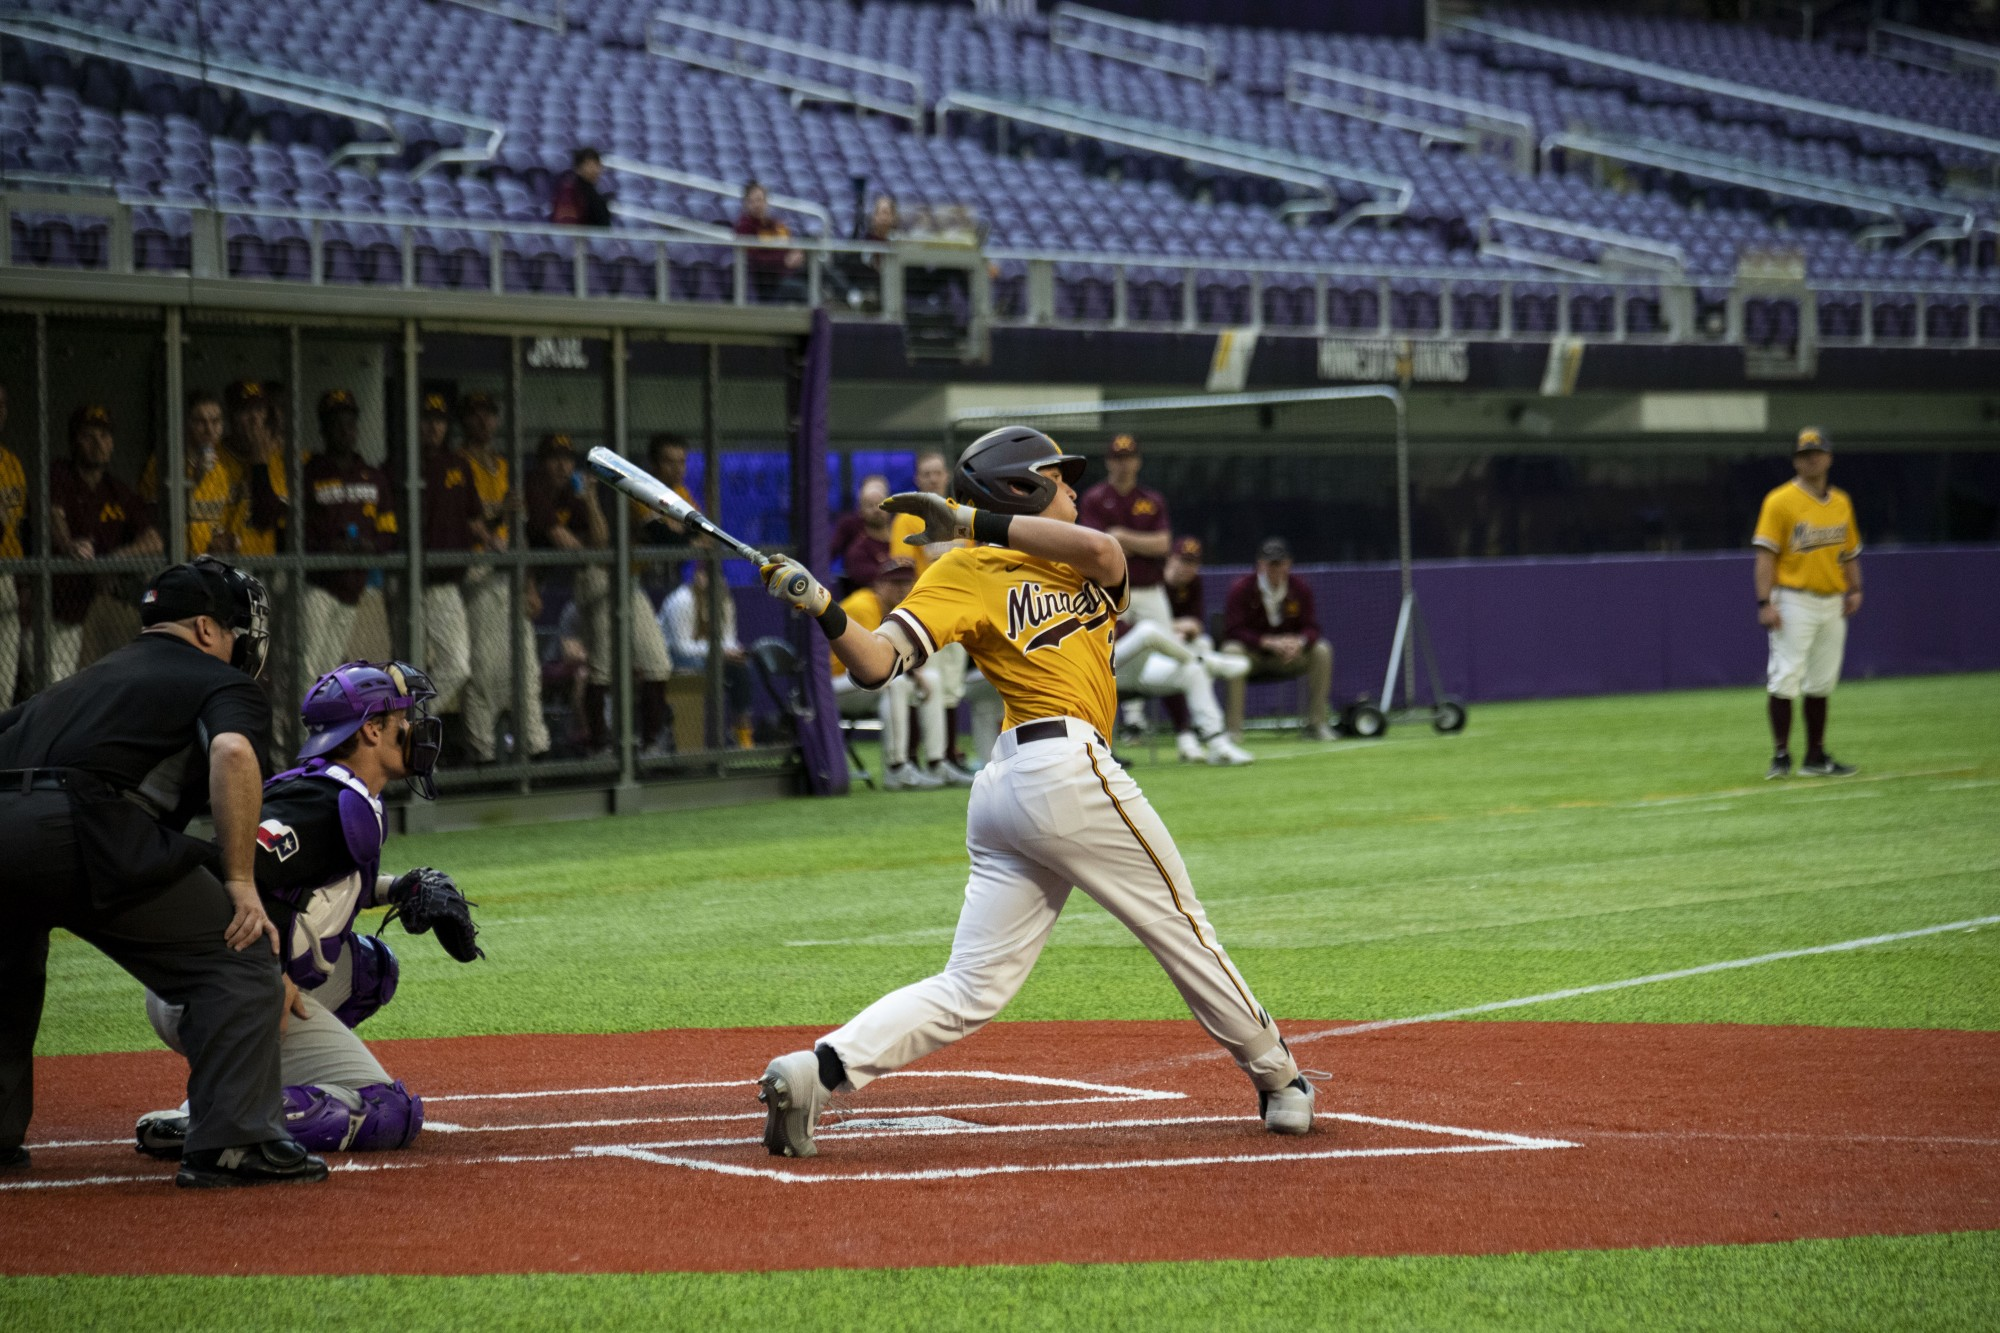 Infielder Jack Wassel swings at bat during the Gophers' 7-6 win against Texas Christian University at U.S. Bank Stadium on Saturday, Feb. 23.